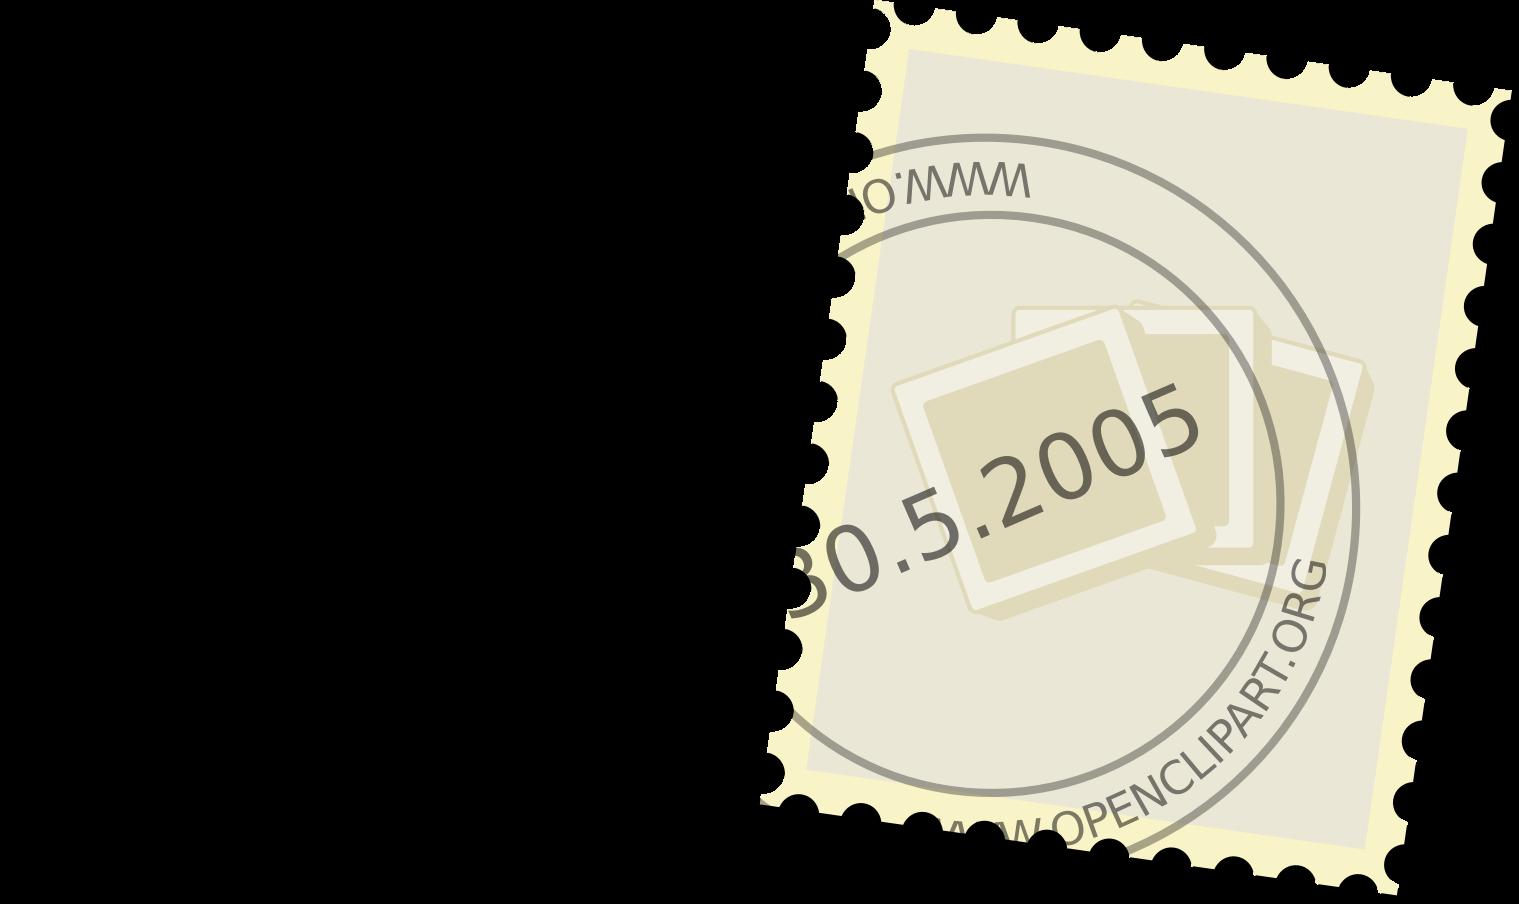 Big image png. Stamp clipart postage stamp